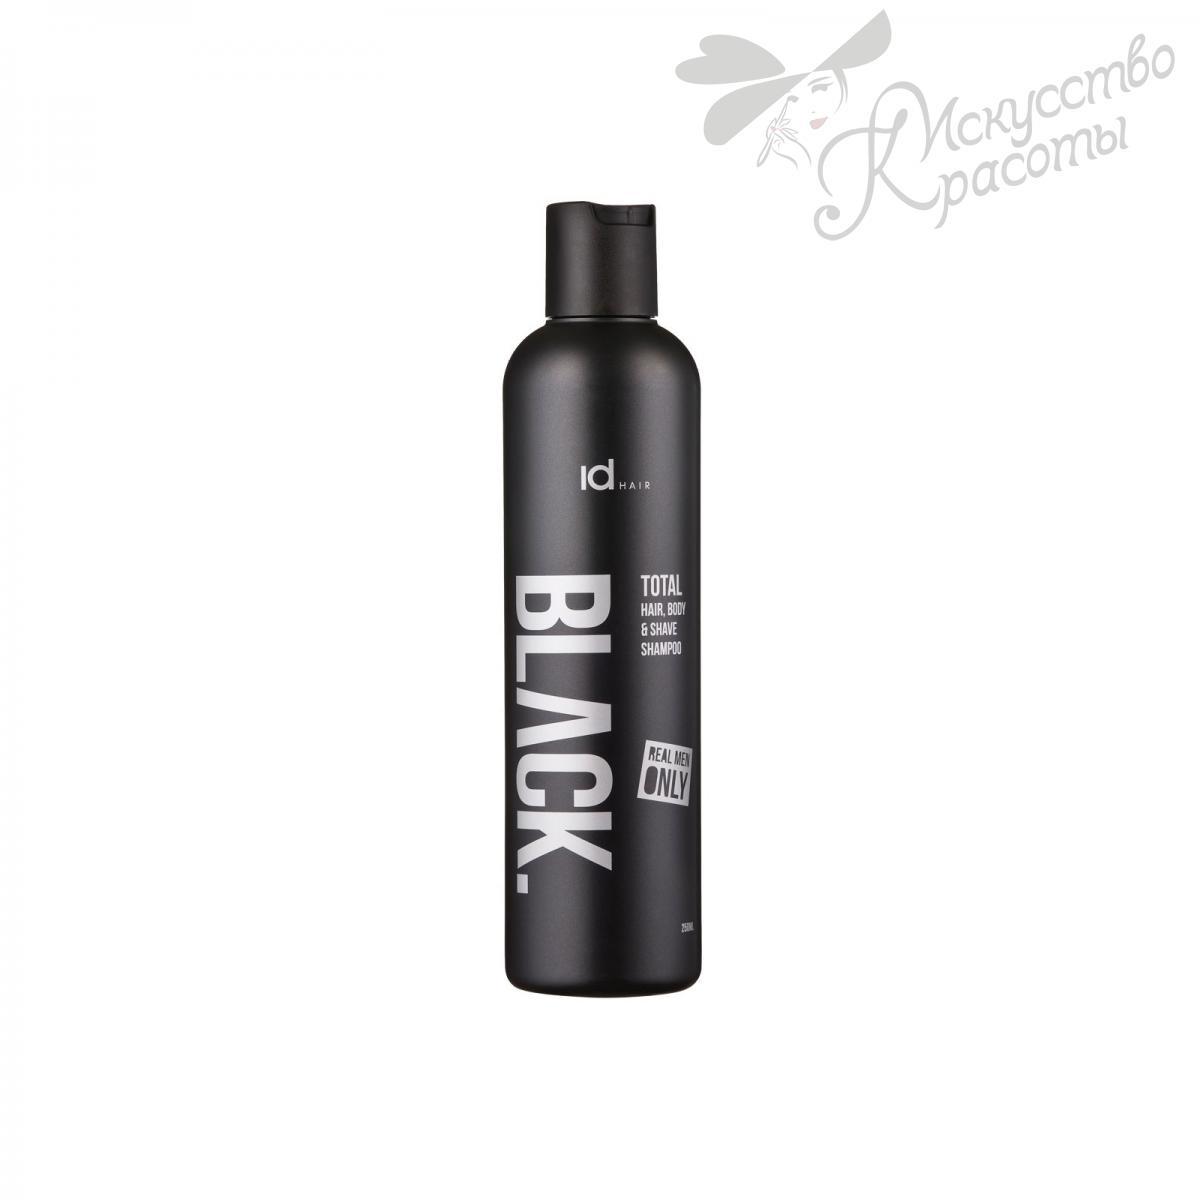 Средство 3 в 1 гель для душа, шампунь, гель для бритья Shampoo Total 3 in 1 ID hair For Men Black 250 мл